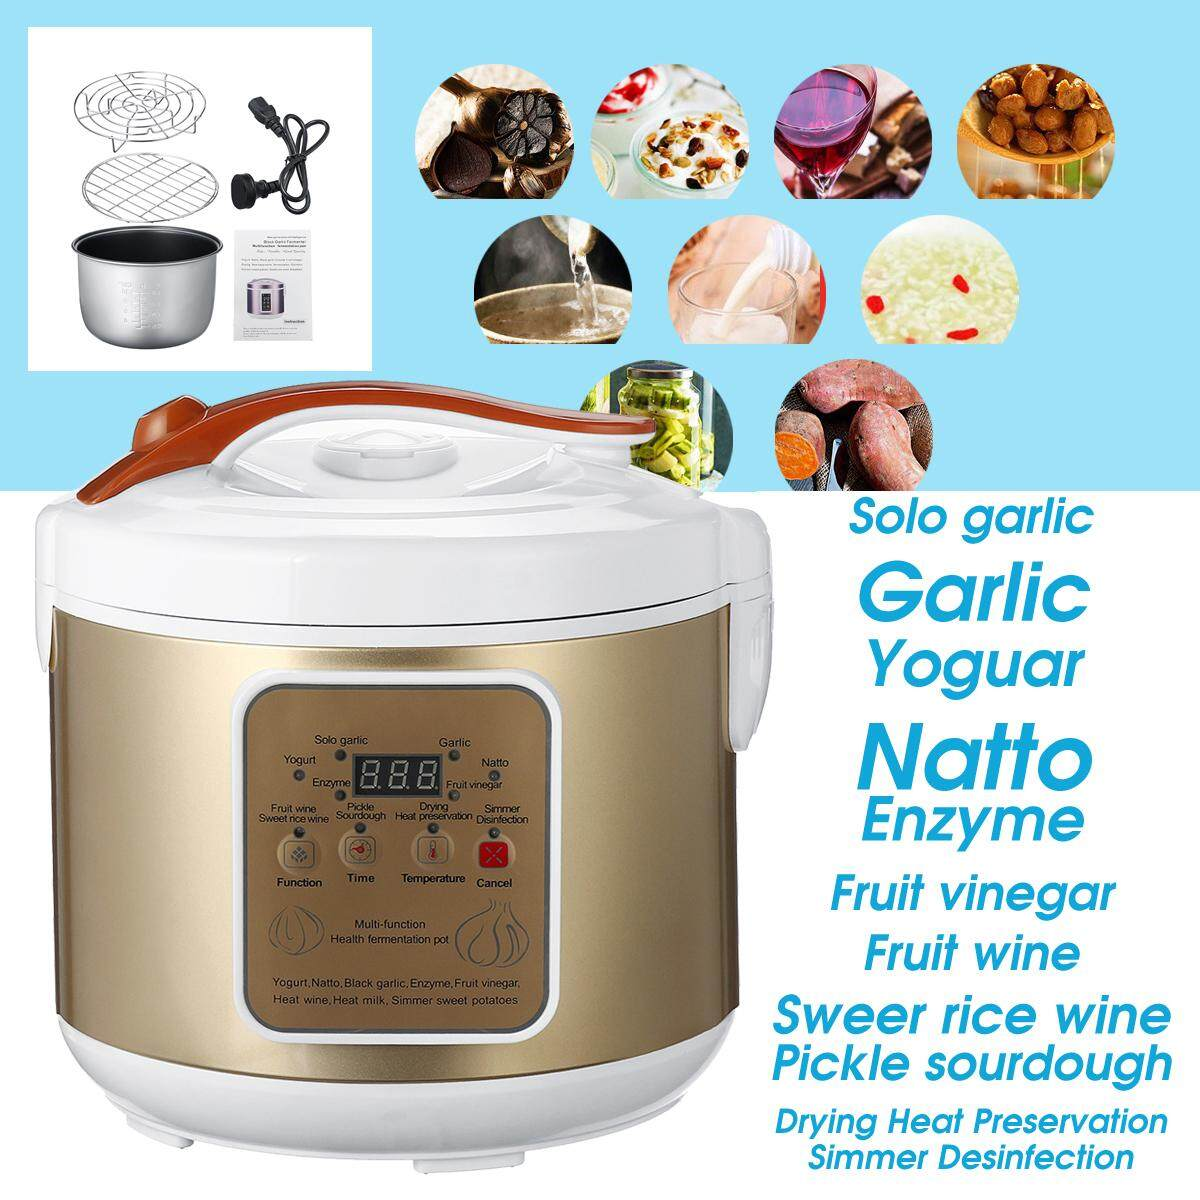 5l 90w Automatic Black Garlic Fermenter Ferment Garlic Yogurt Natto Wine Maker By Audew.